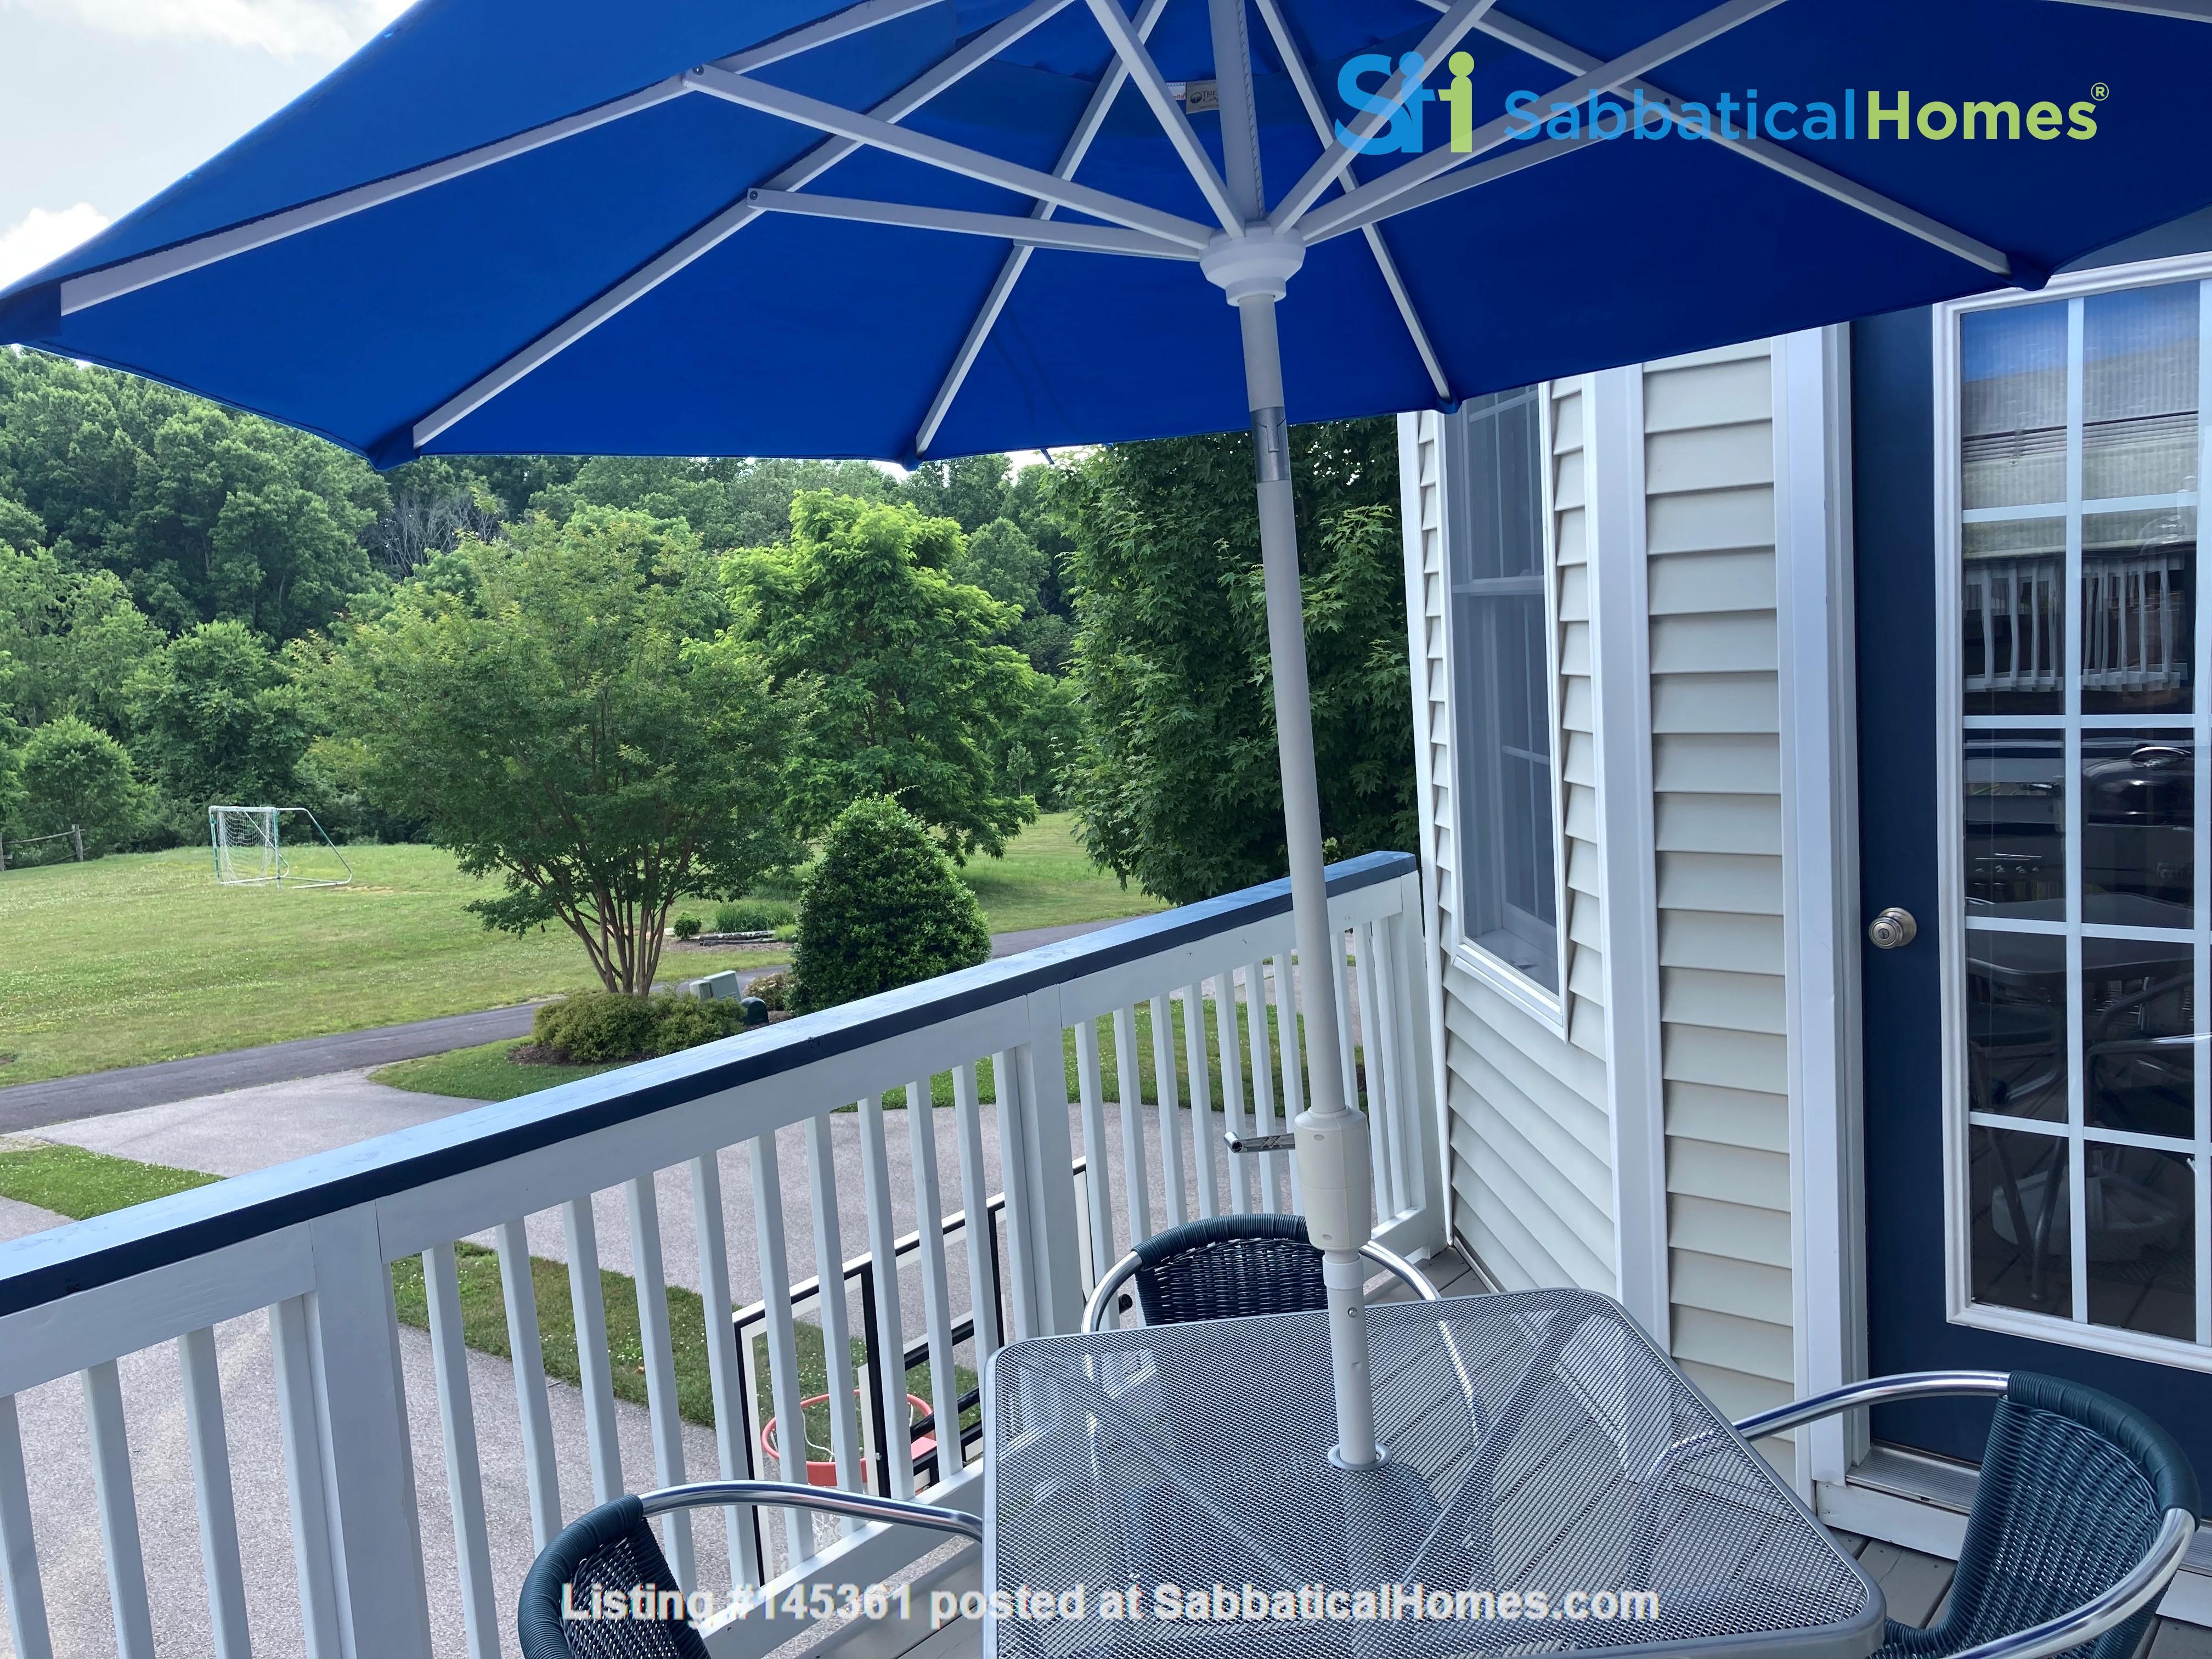 Amazing Blacksburg Townhome in Ideal Location Home Rental in Blacksburg, Virginia, United States 9